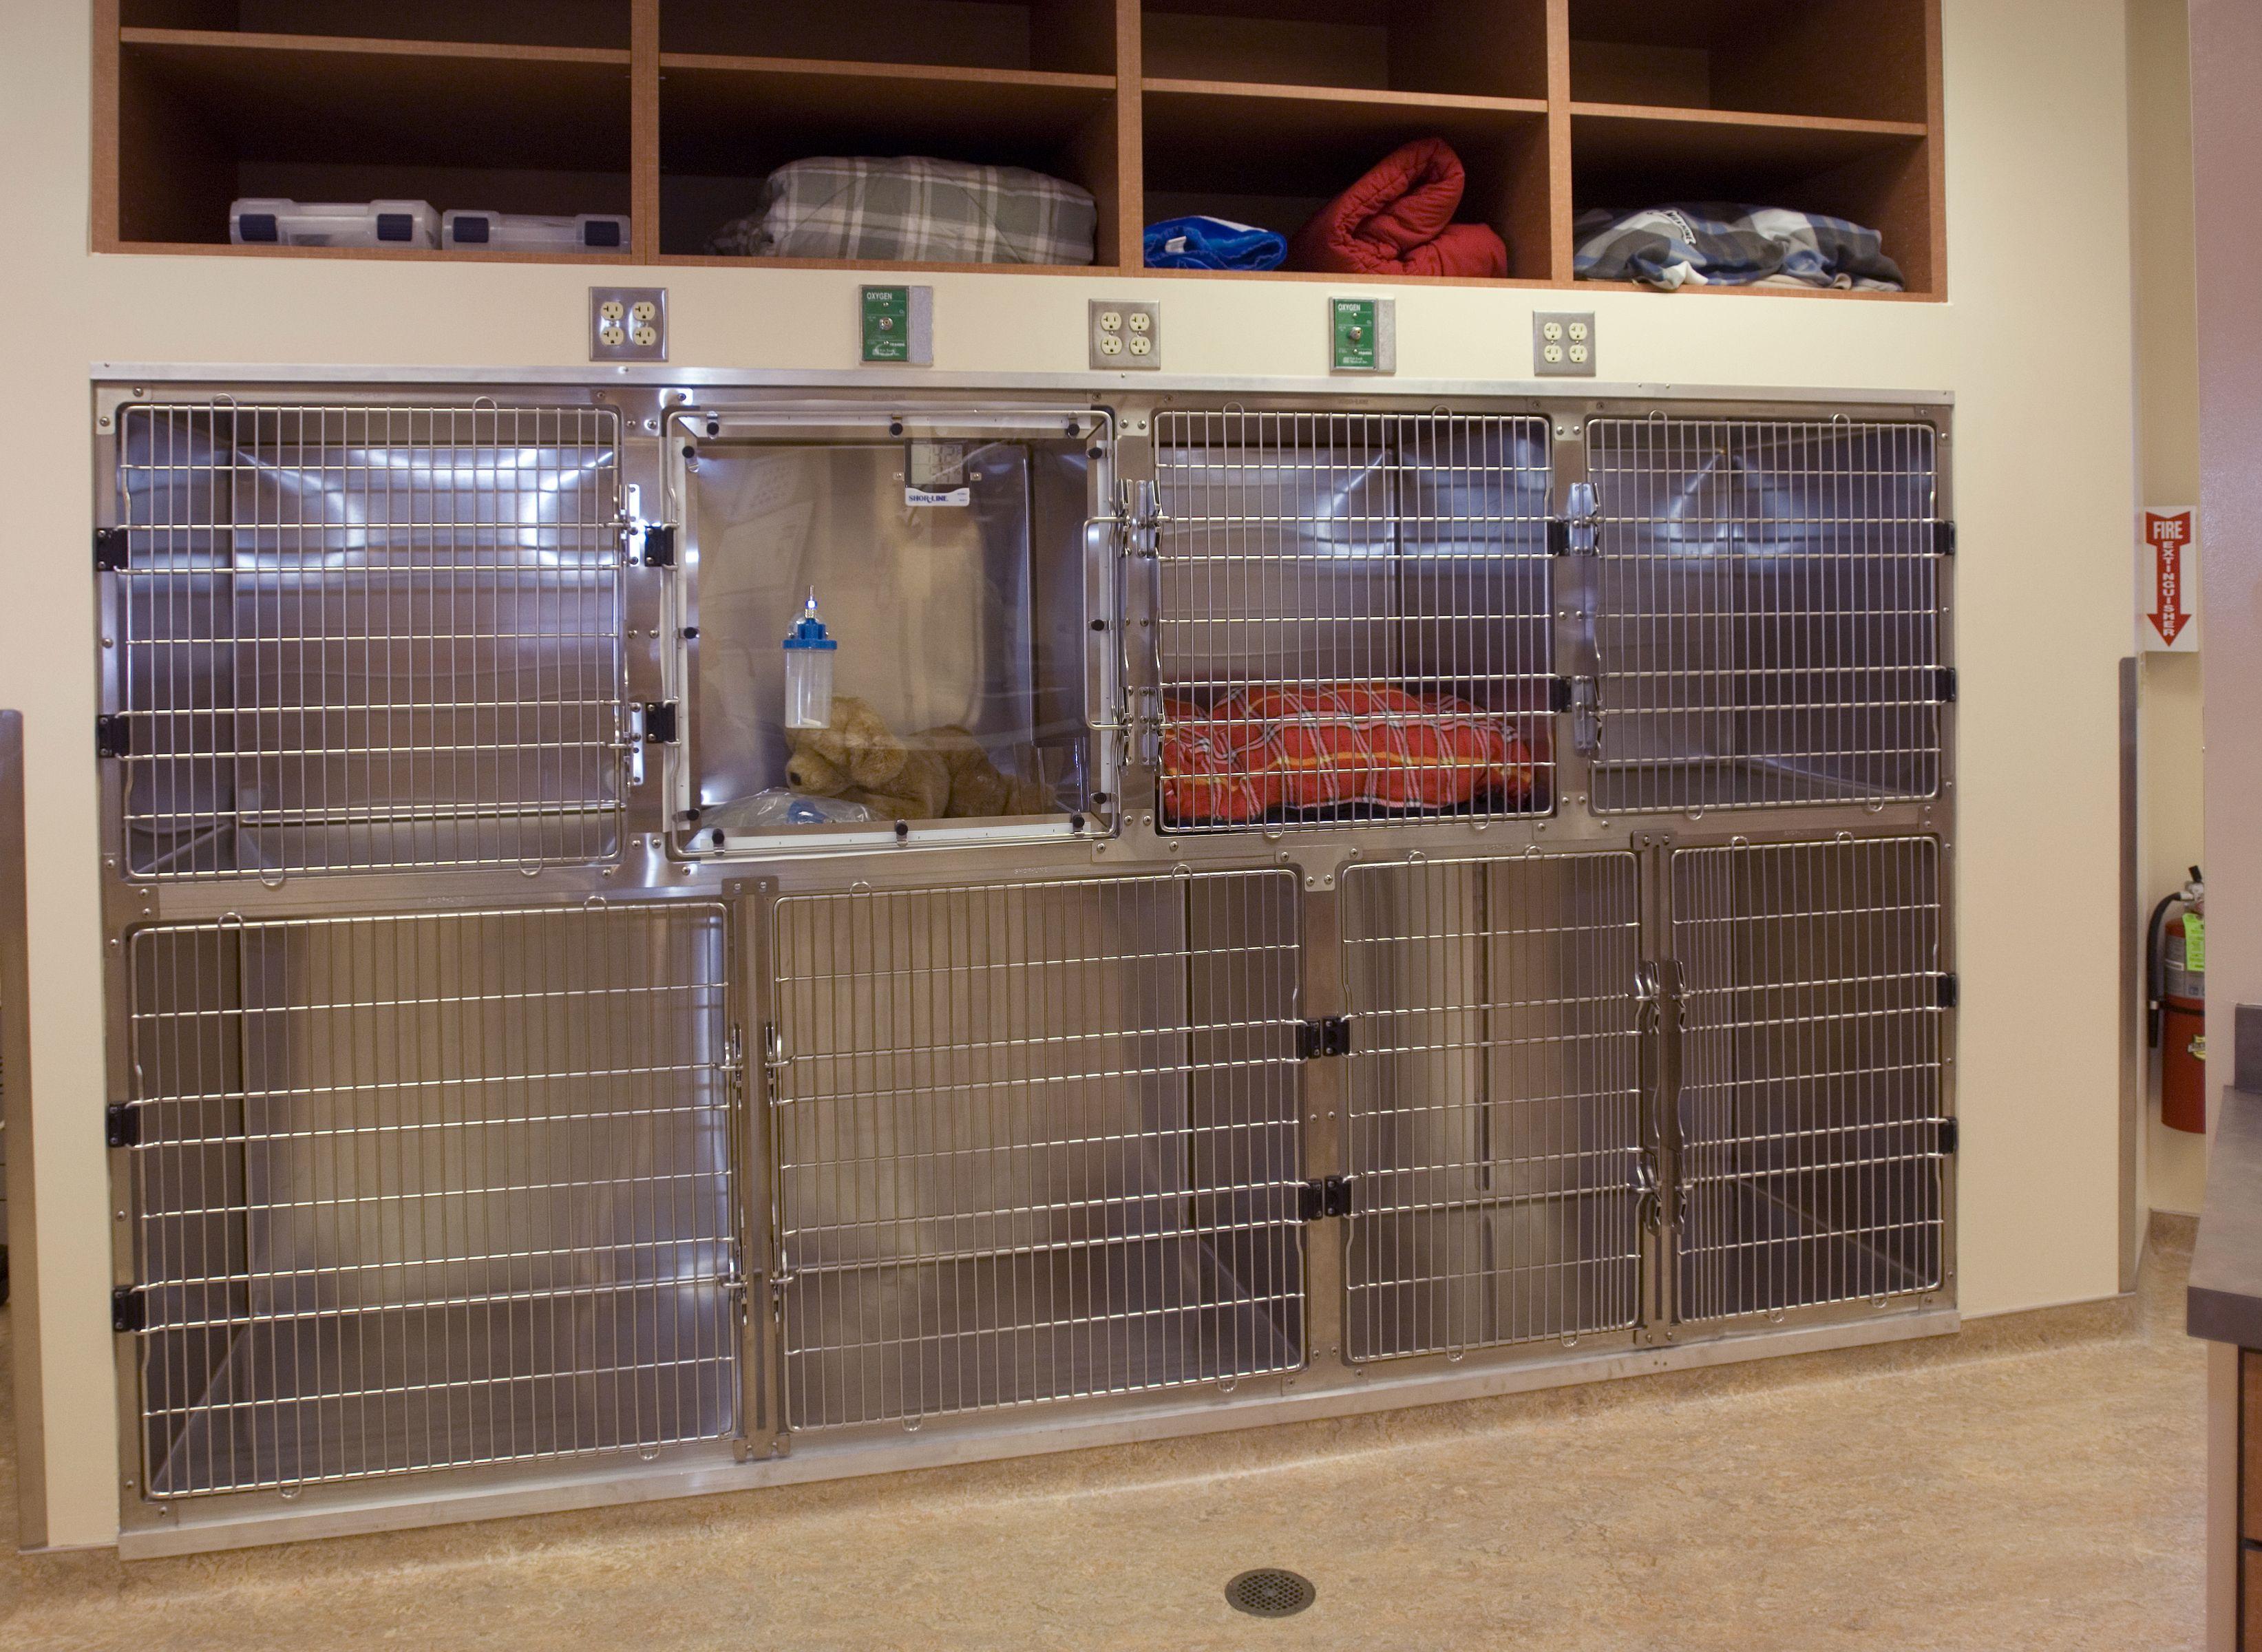 Cages Vet clinics, Clinic design, Hospital design